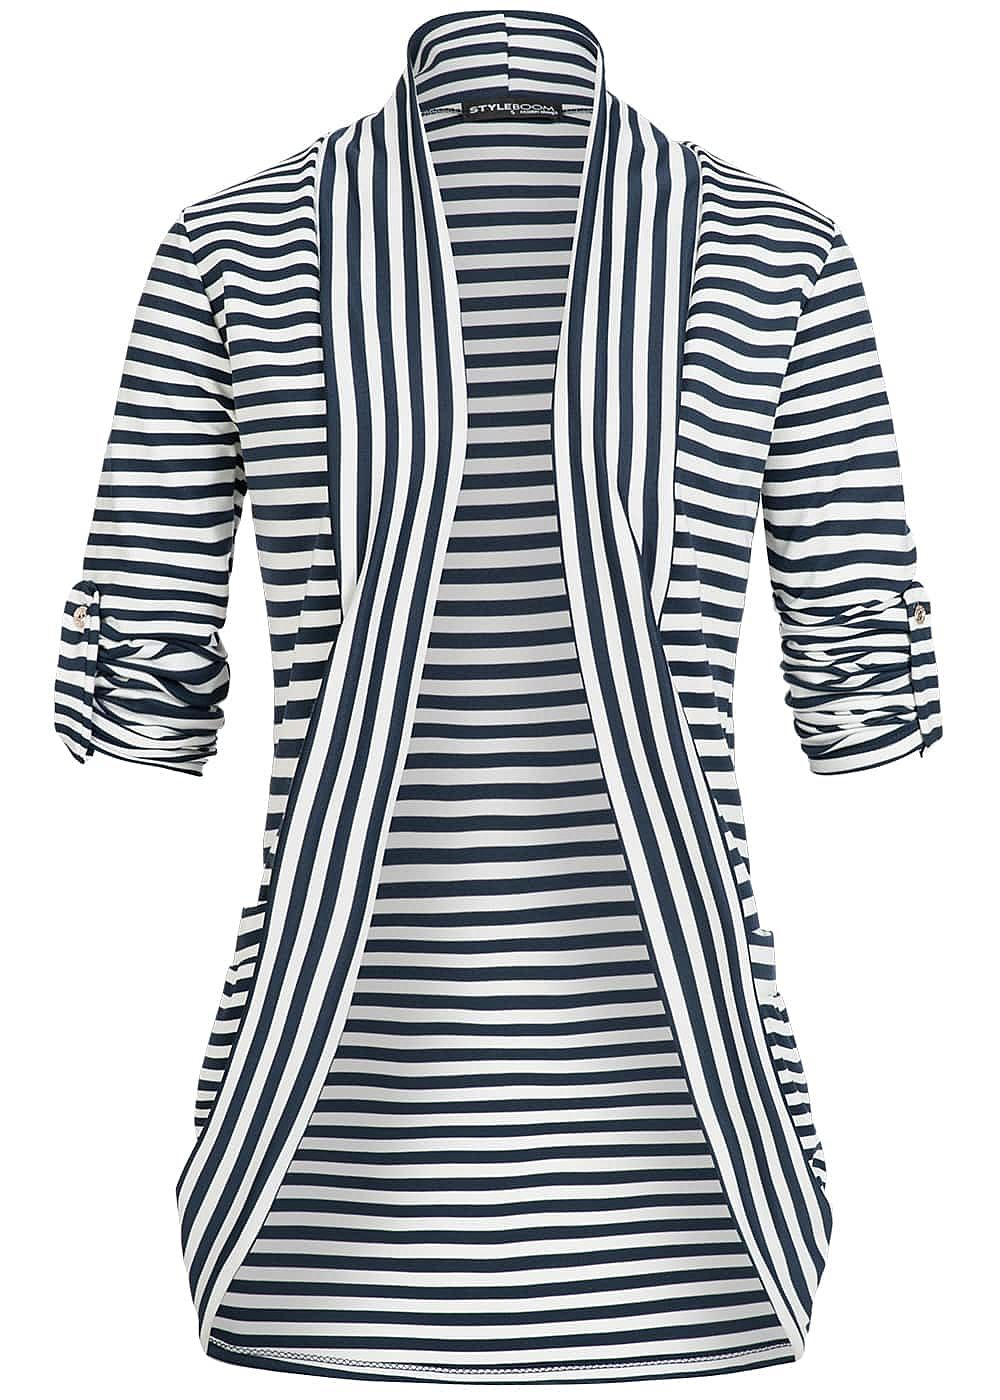 styleboom fashion damen turn up cardigan gestreift navy blau weiss 77onlineshop. Black Bedroom Furniture Sets. Home Design Ideas